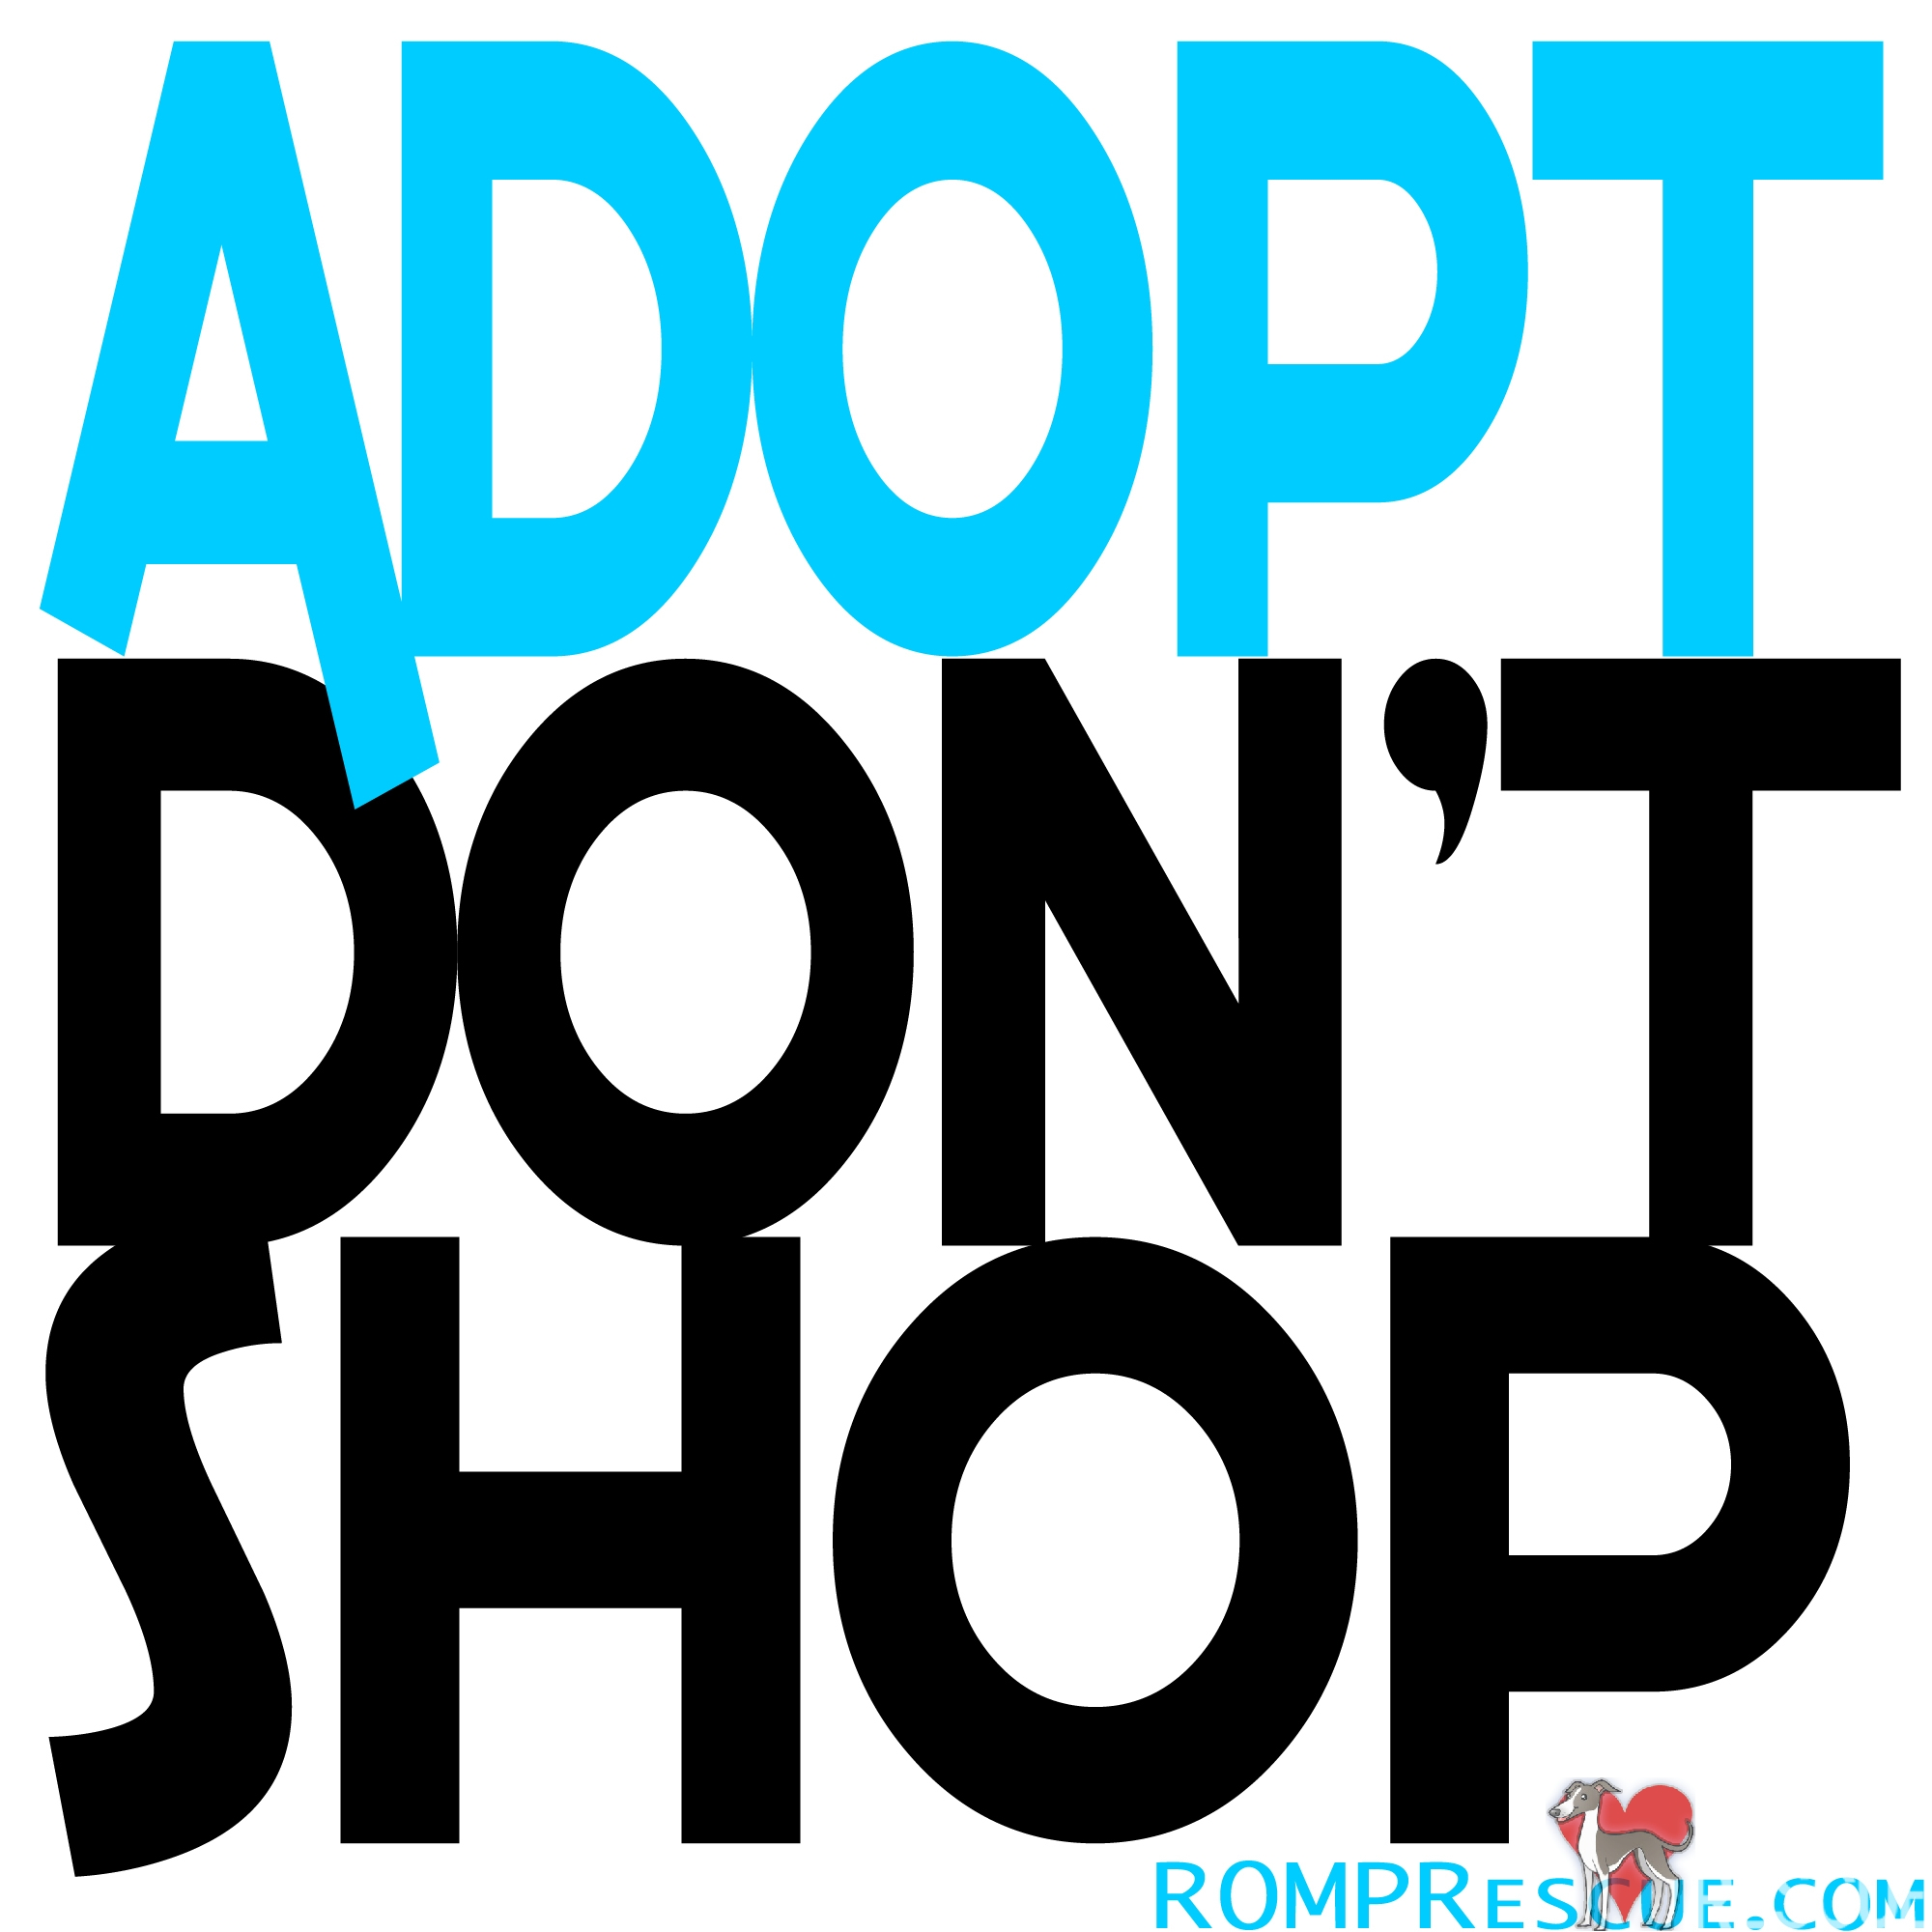 Italian Greyhound Shirts, adopt dont shop shirt, adopt dont shop, romp rescue, pet rescue, dog rescue, animal rescue